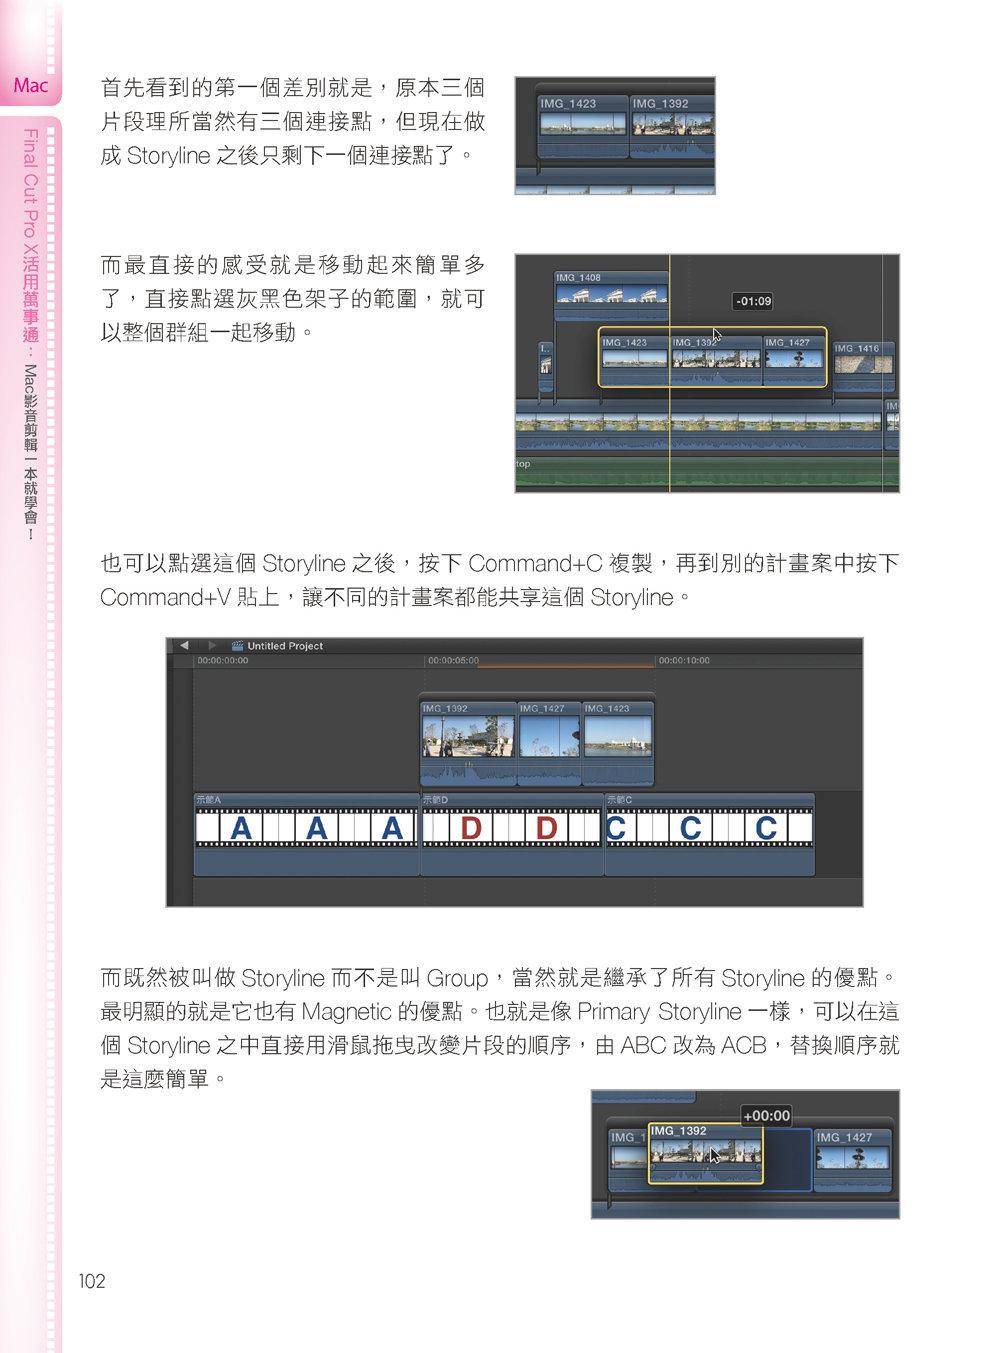 Final Cut Pro X 活用萬事通:Mac 影音剪輯一本就學會!(暢銷回饋版)-preview-10